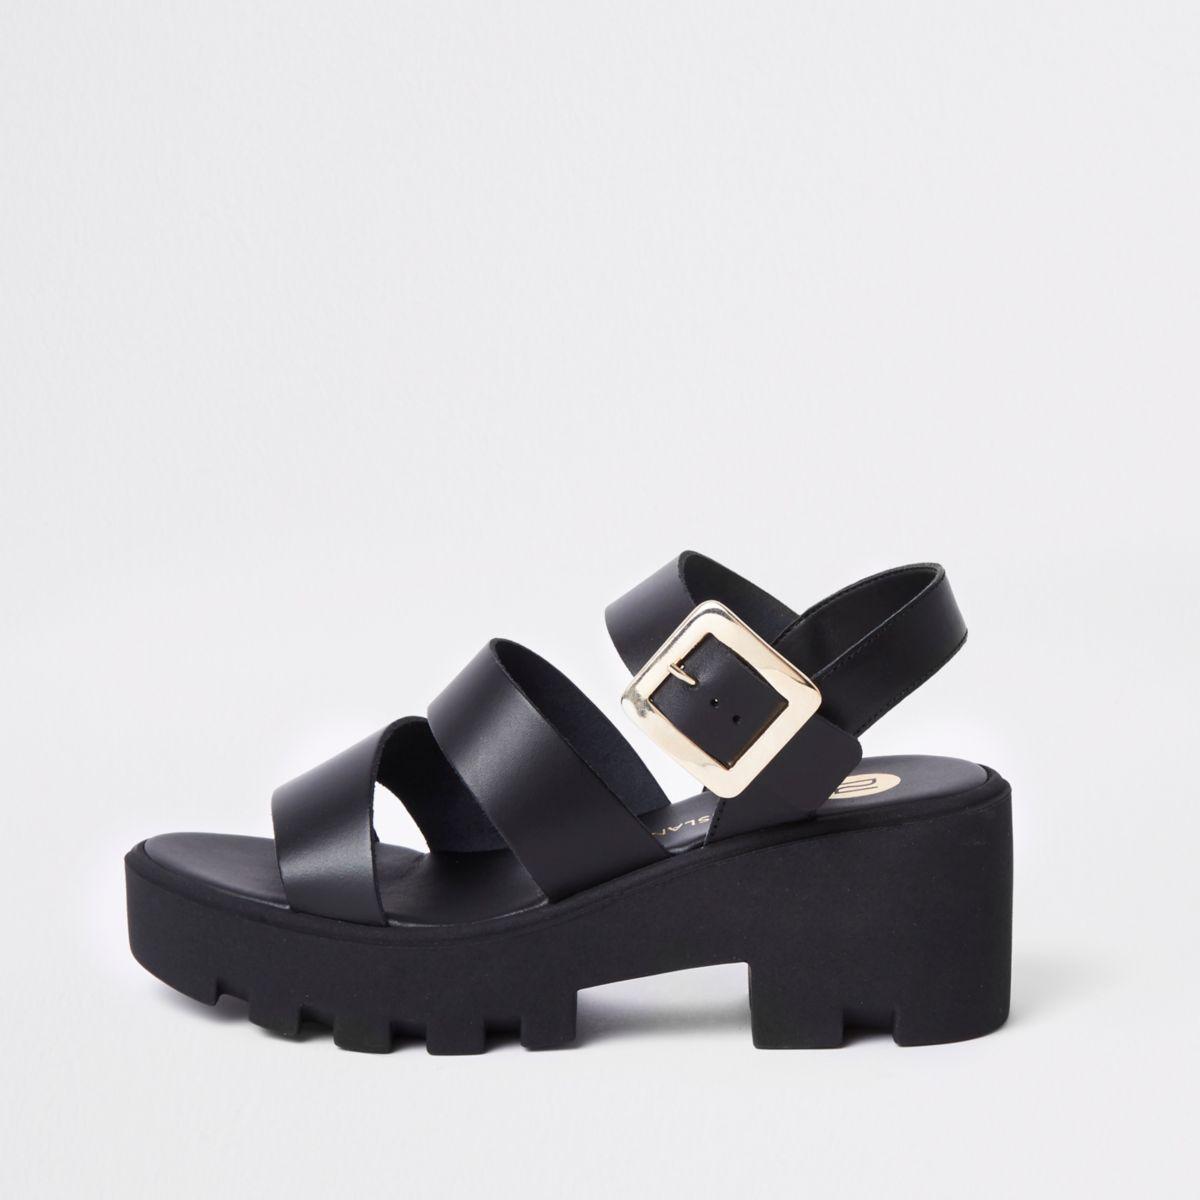 Black chunky sandals